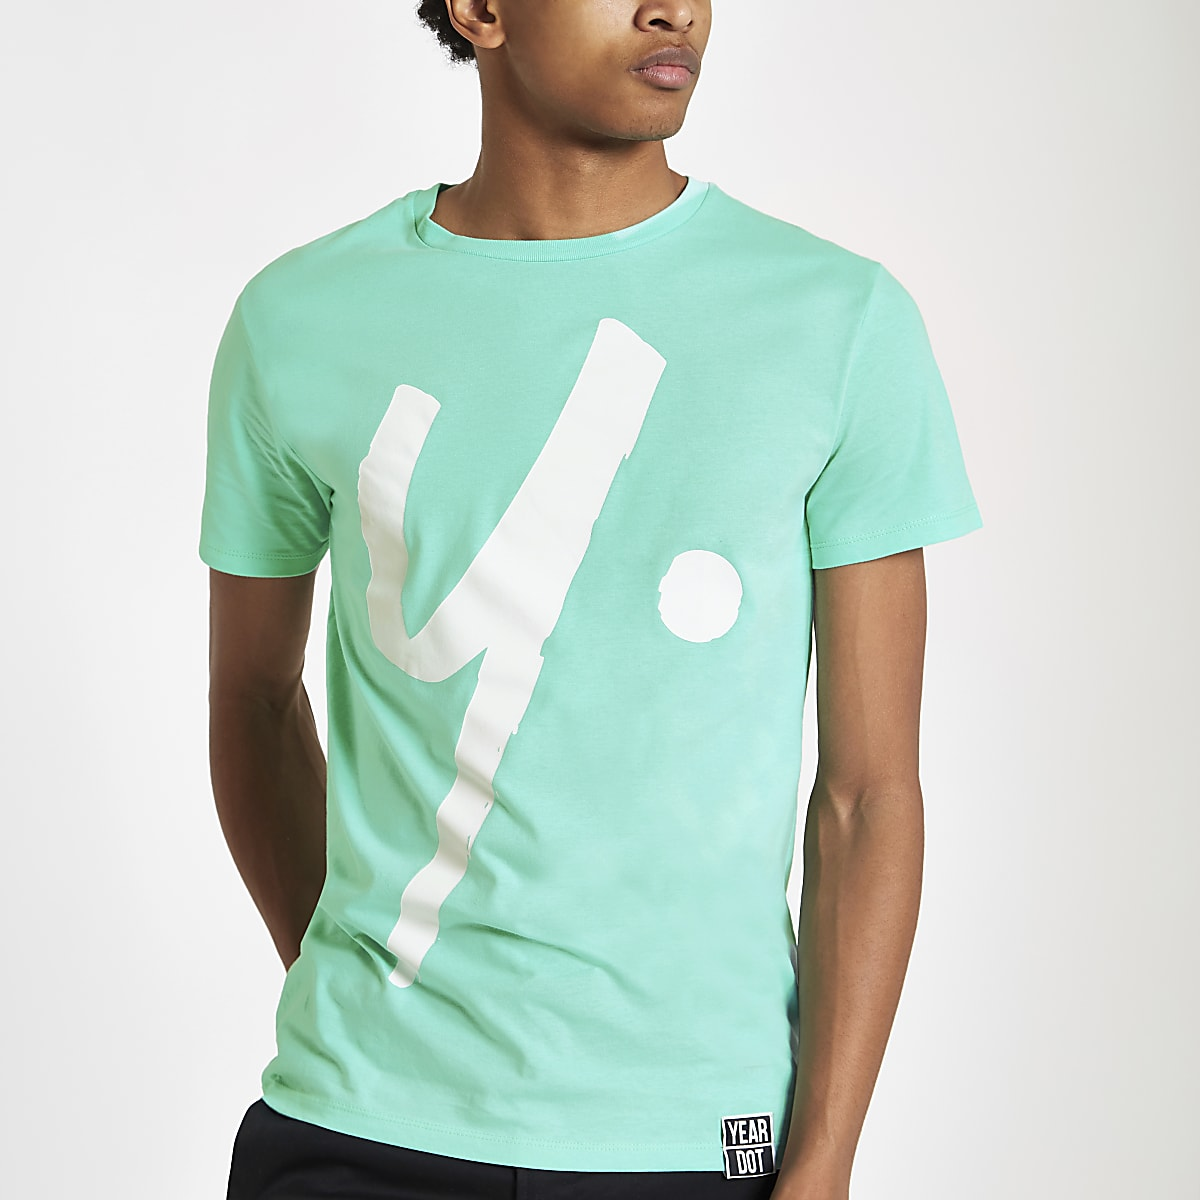 Year Dot mint green logo T-shirt